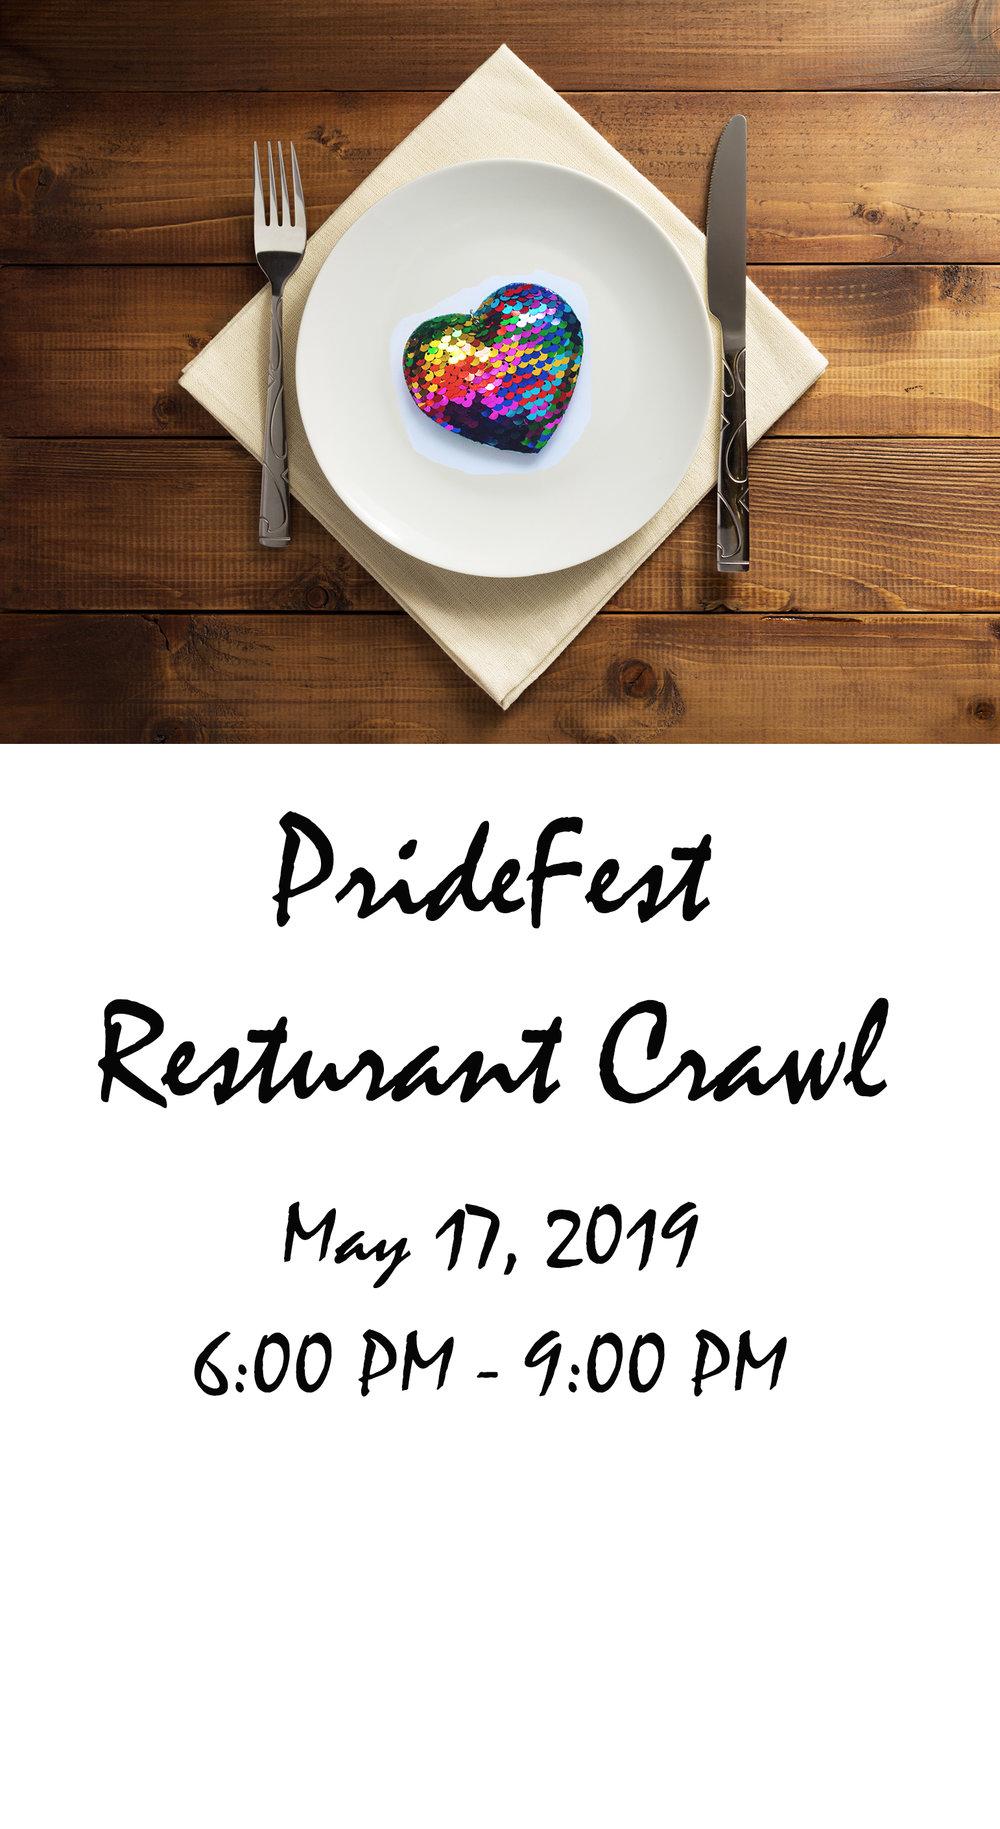 Resturant Crawl 2.jpg